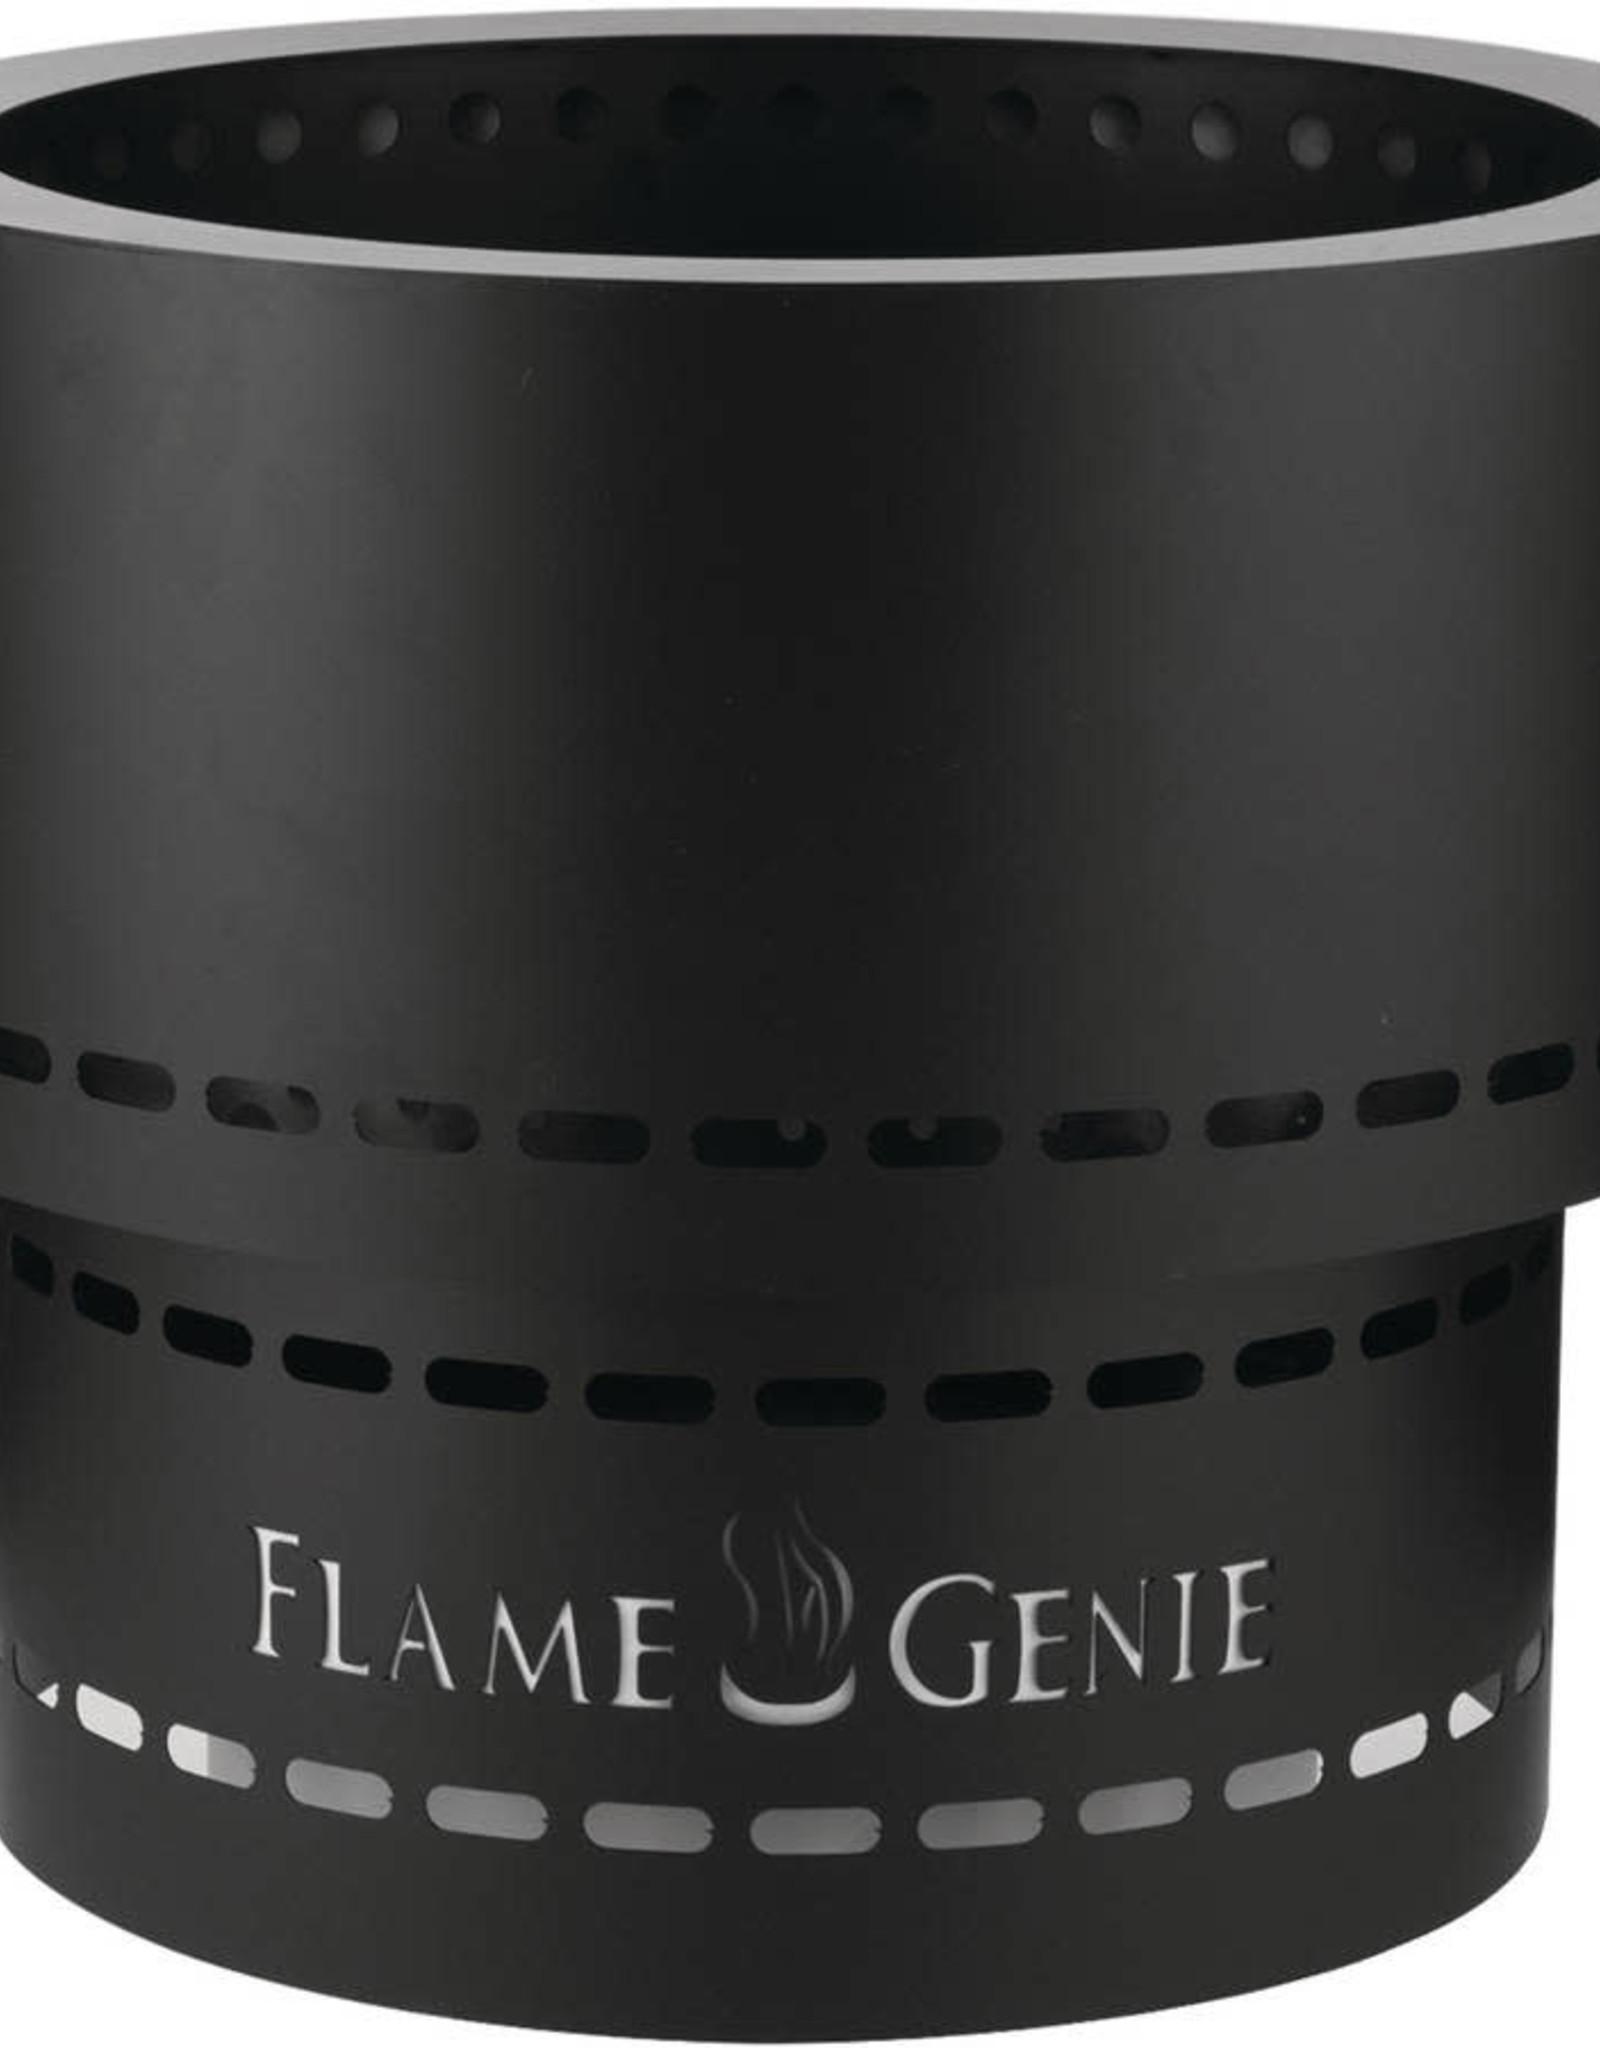 "Flame Genie Flame Genie Inferno 19"" Wood Pellet Fire Pit FG-19"